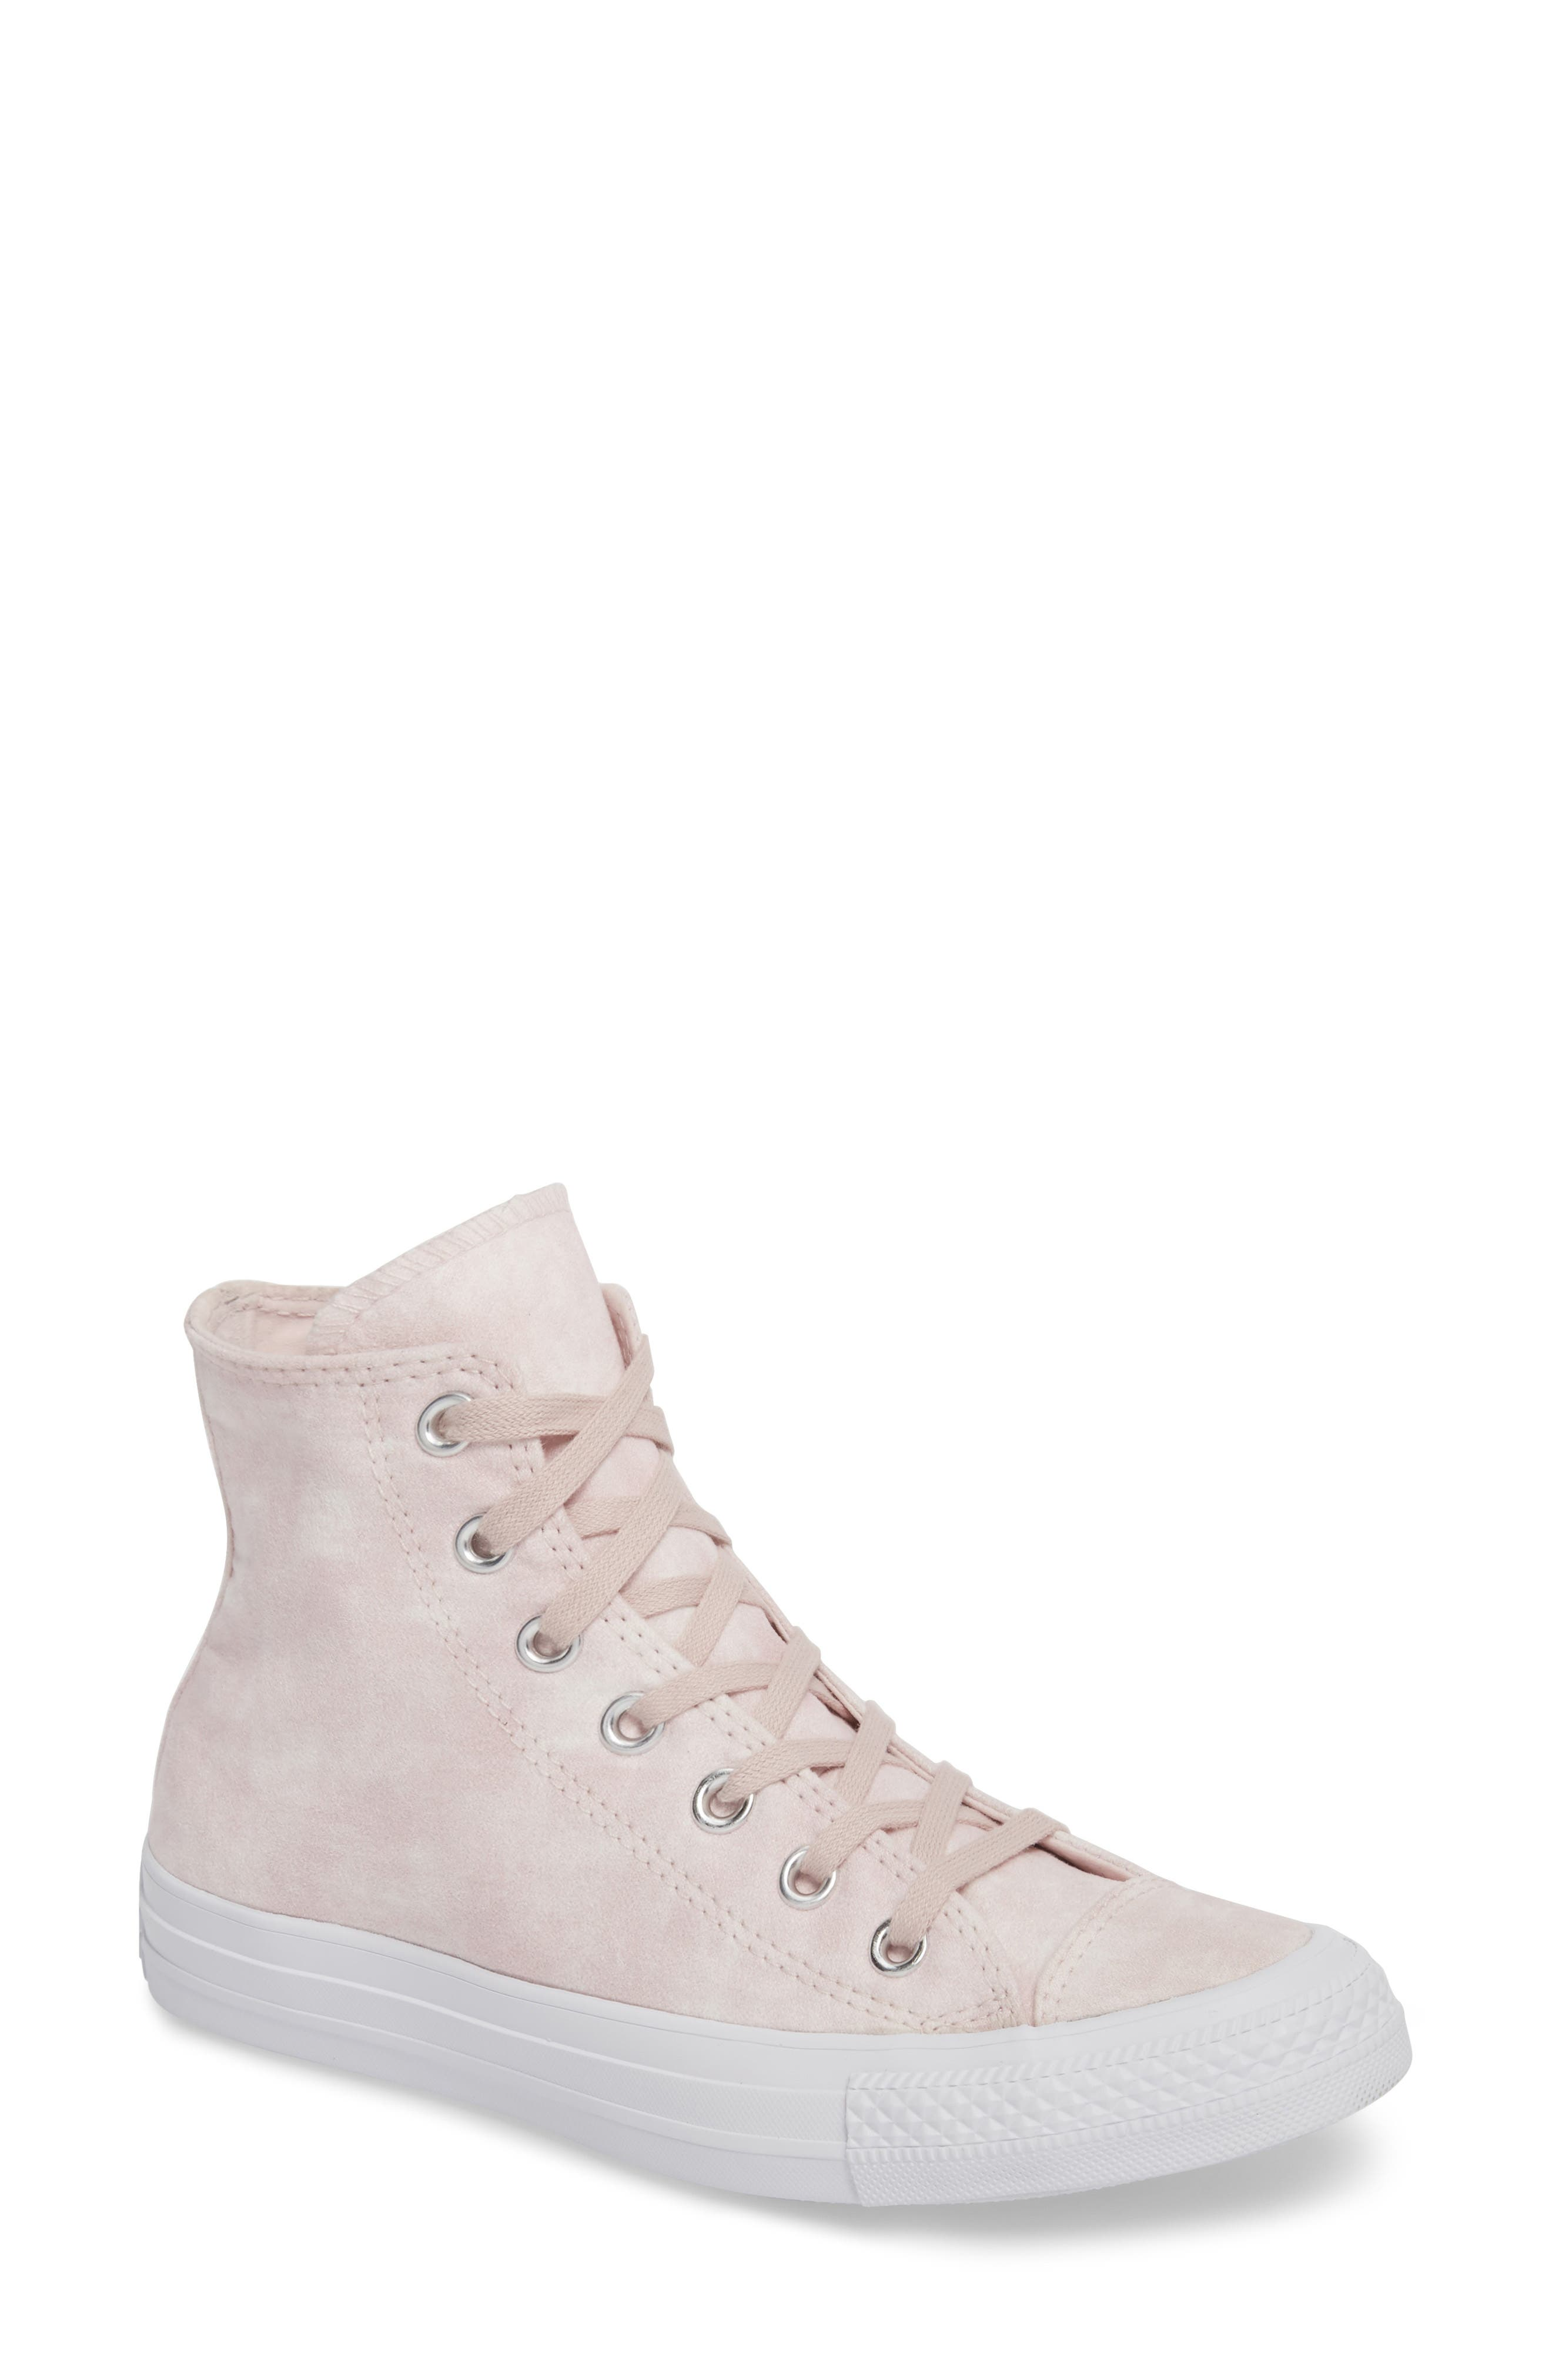 Converse Chuck Taylor® All Star® Peached High Top Sneaker (Women)